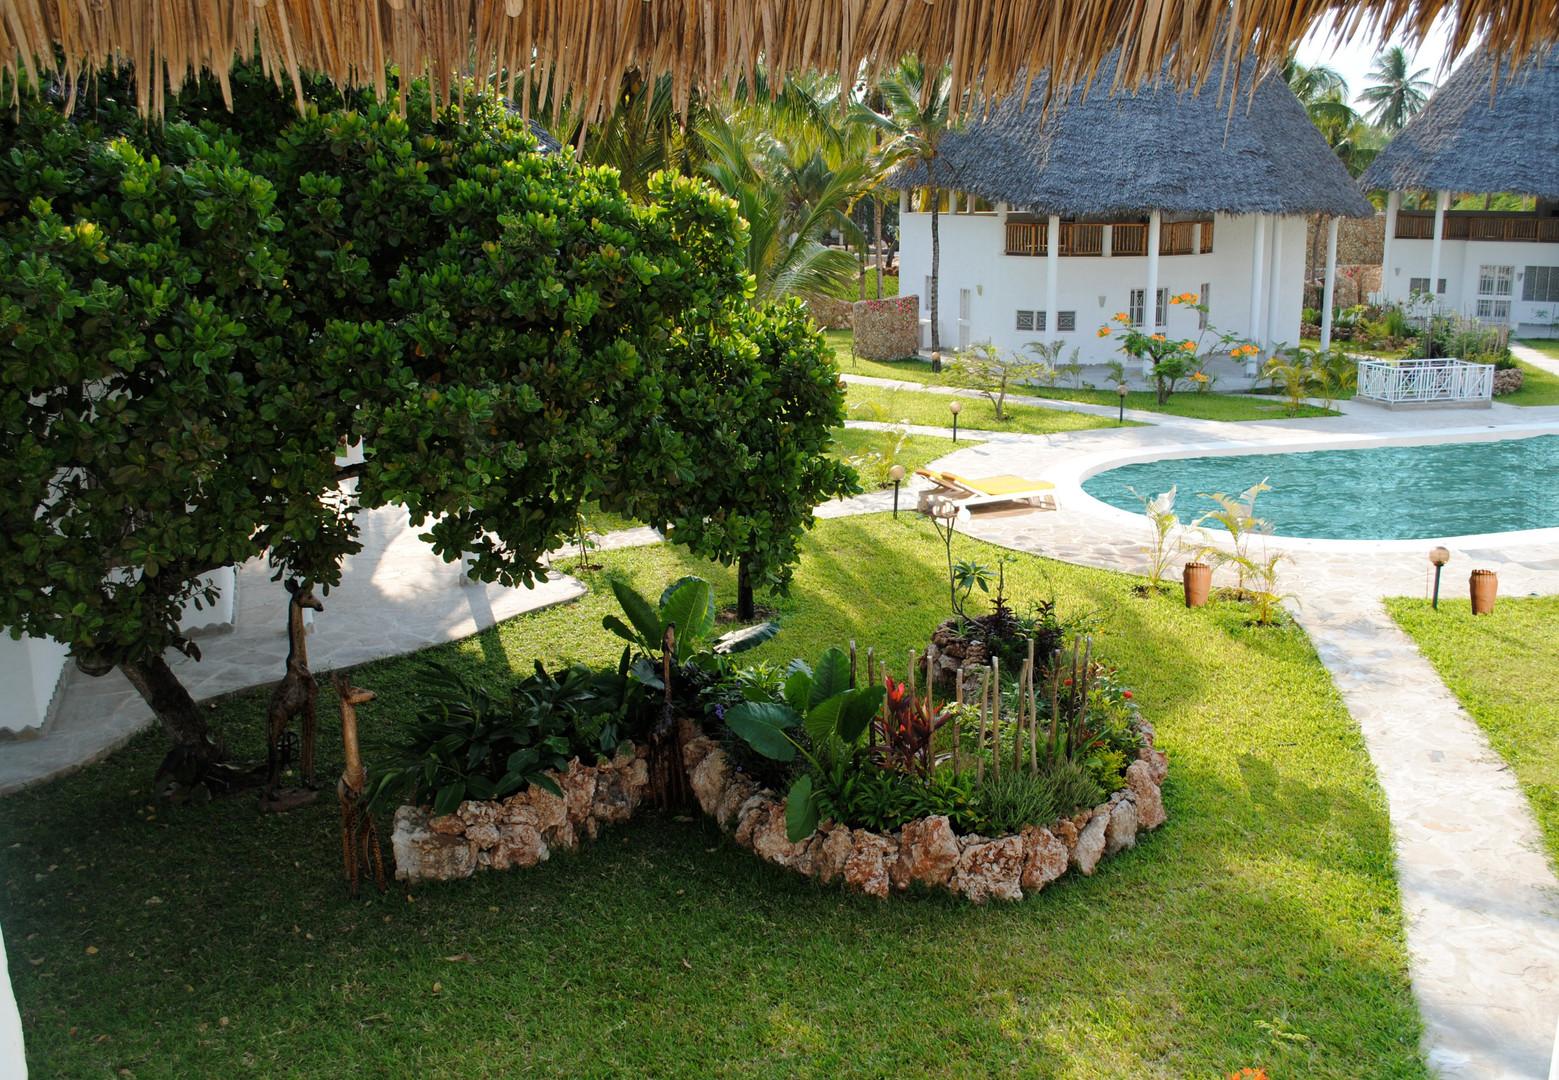 8 villas area kola beach resort mambrui